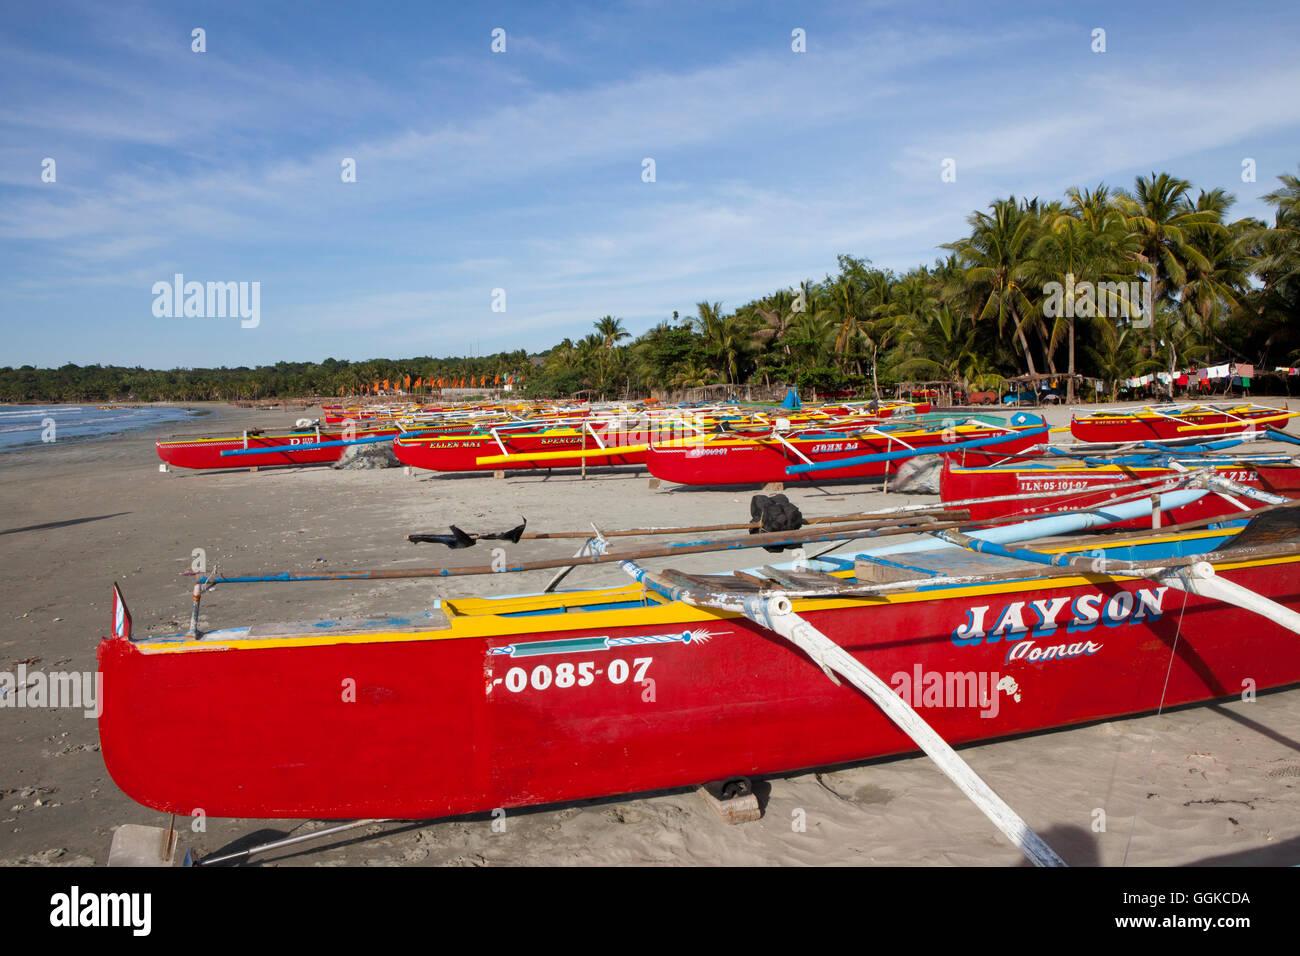 Fishing boats at Pug-Os Beach near Laoag City, Ilocos Norte province on the main island Luzon, Philippines, Asia - Stock Image